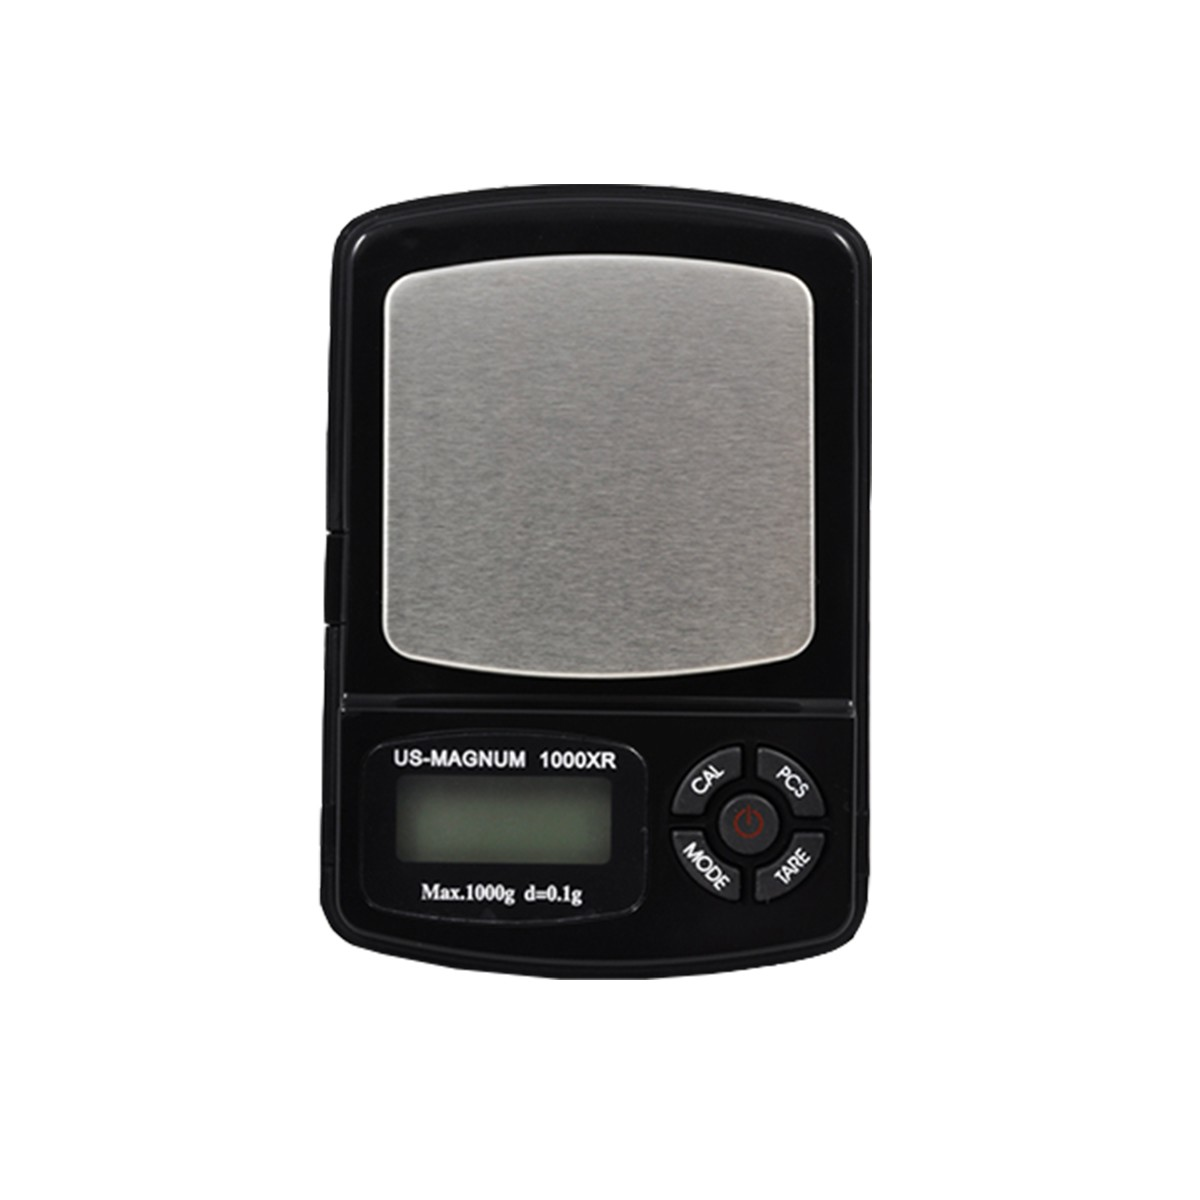 PAC-T940 Digital Gram Scale